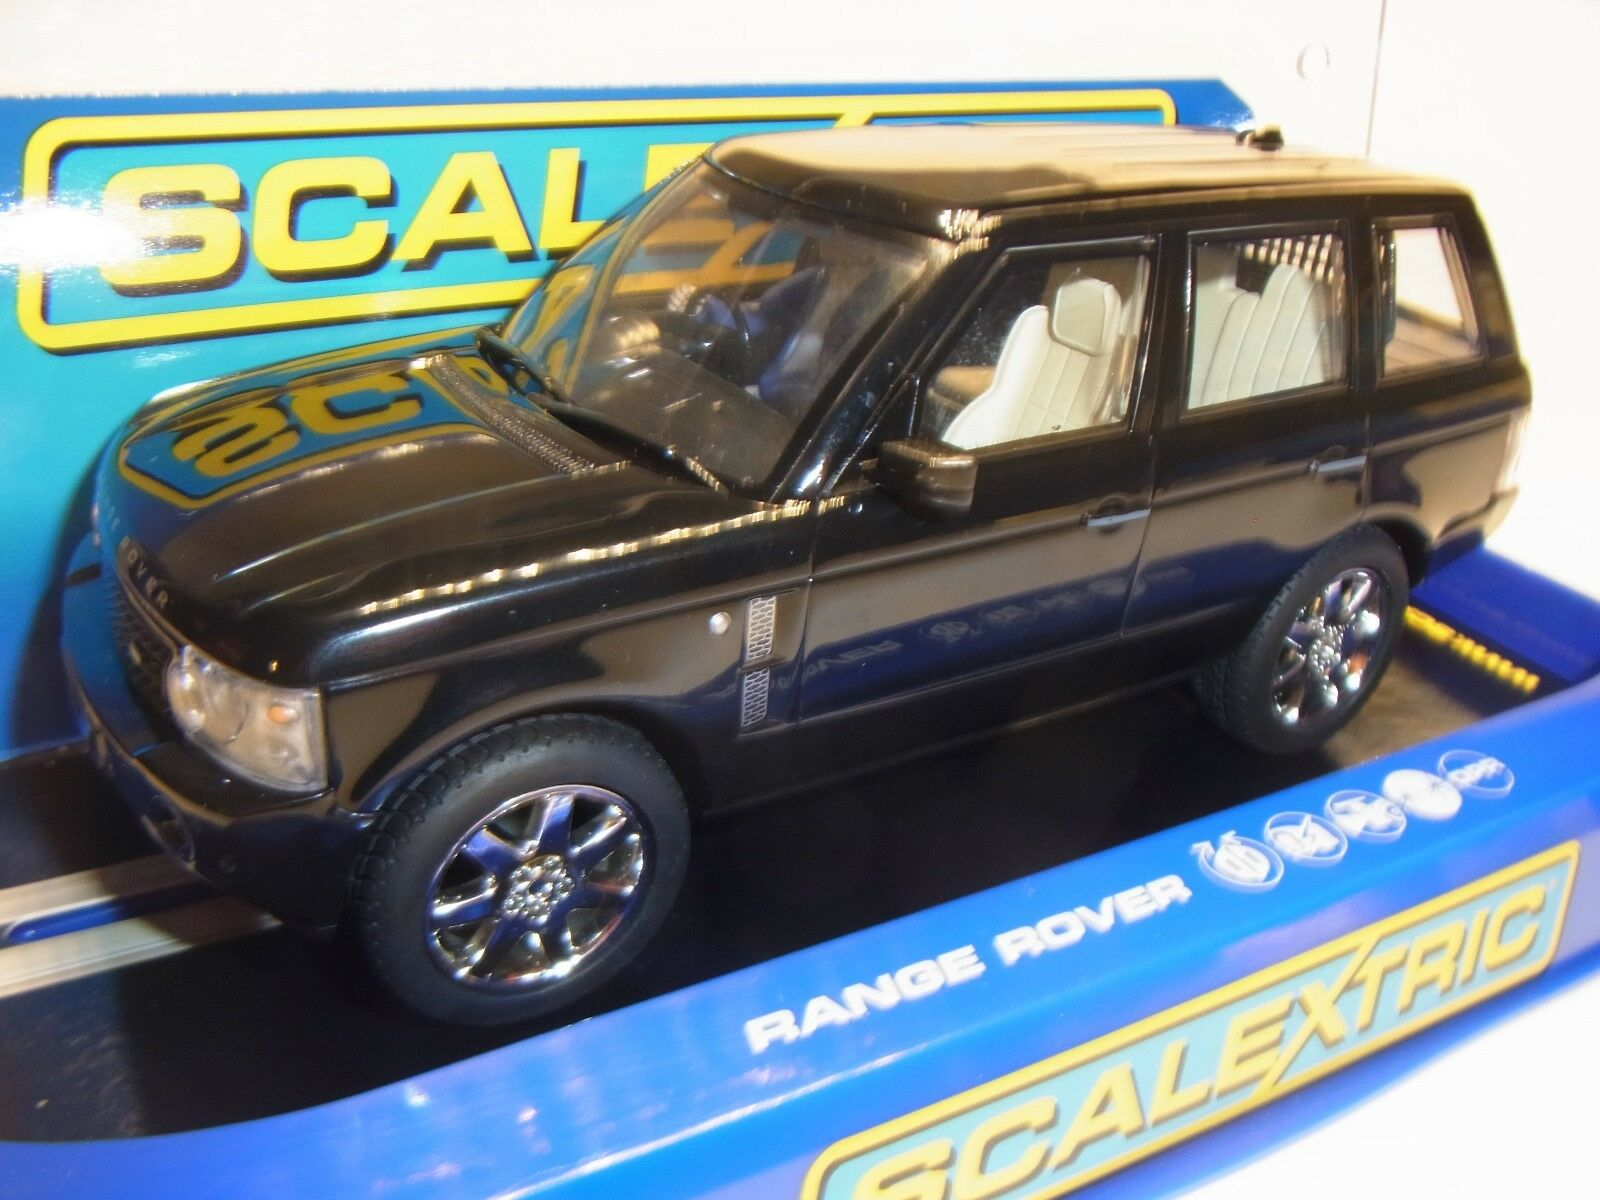 Scalextric Range Rover Nero C2878 Slotcar 1 3 2 Pista per Auto